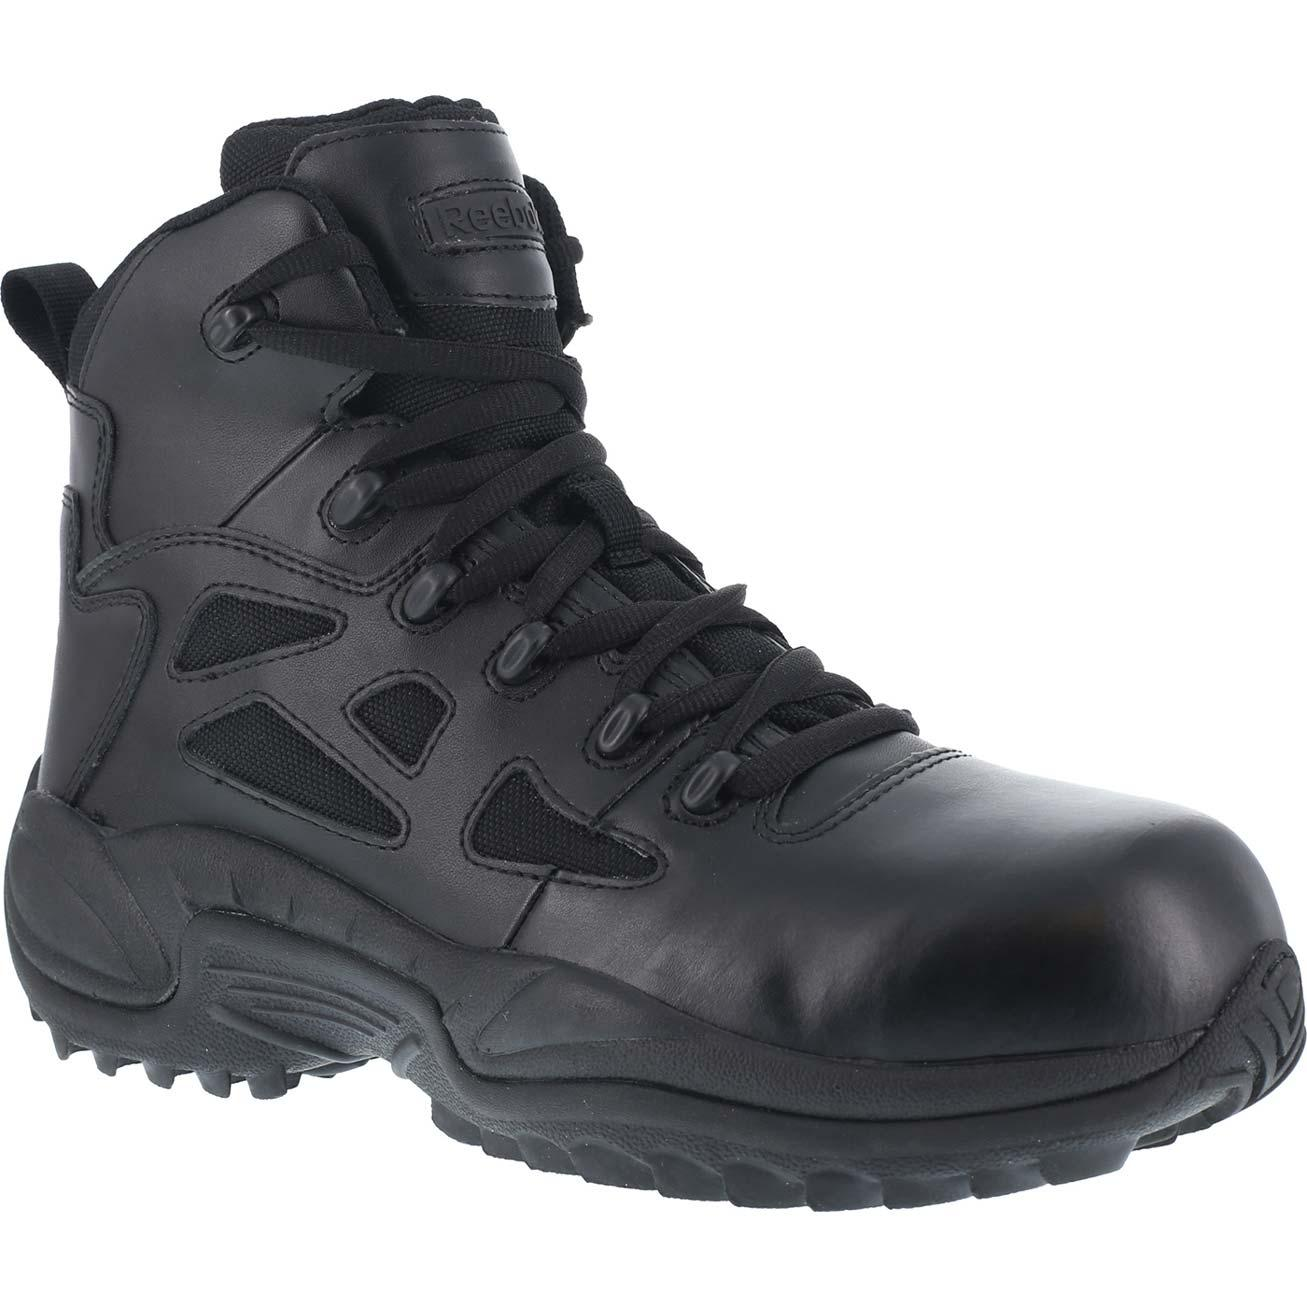 Reebok Black Composite Toe 8